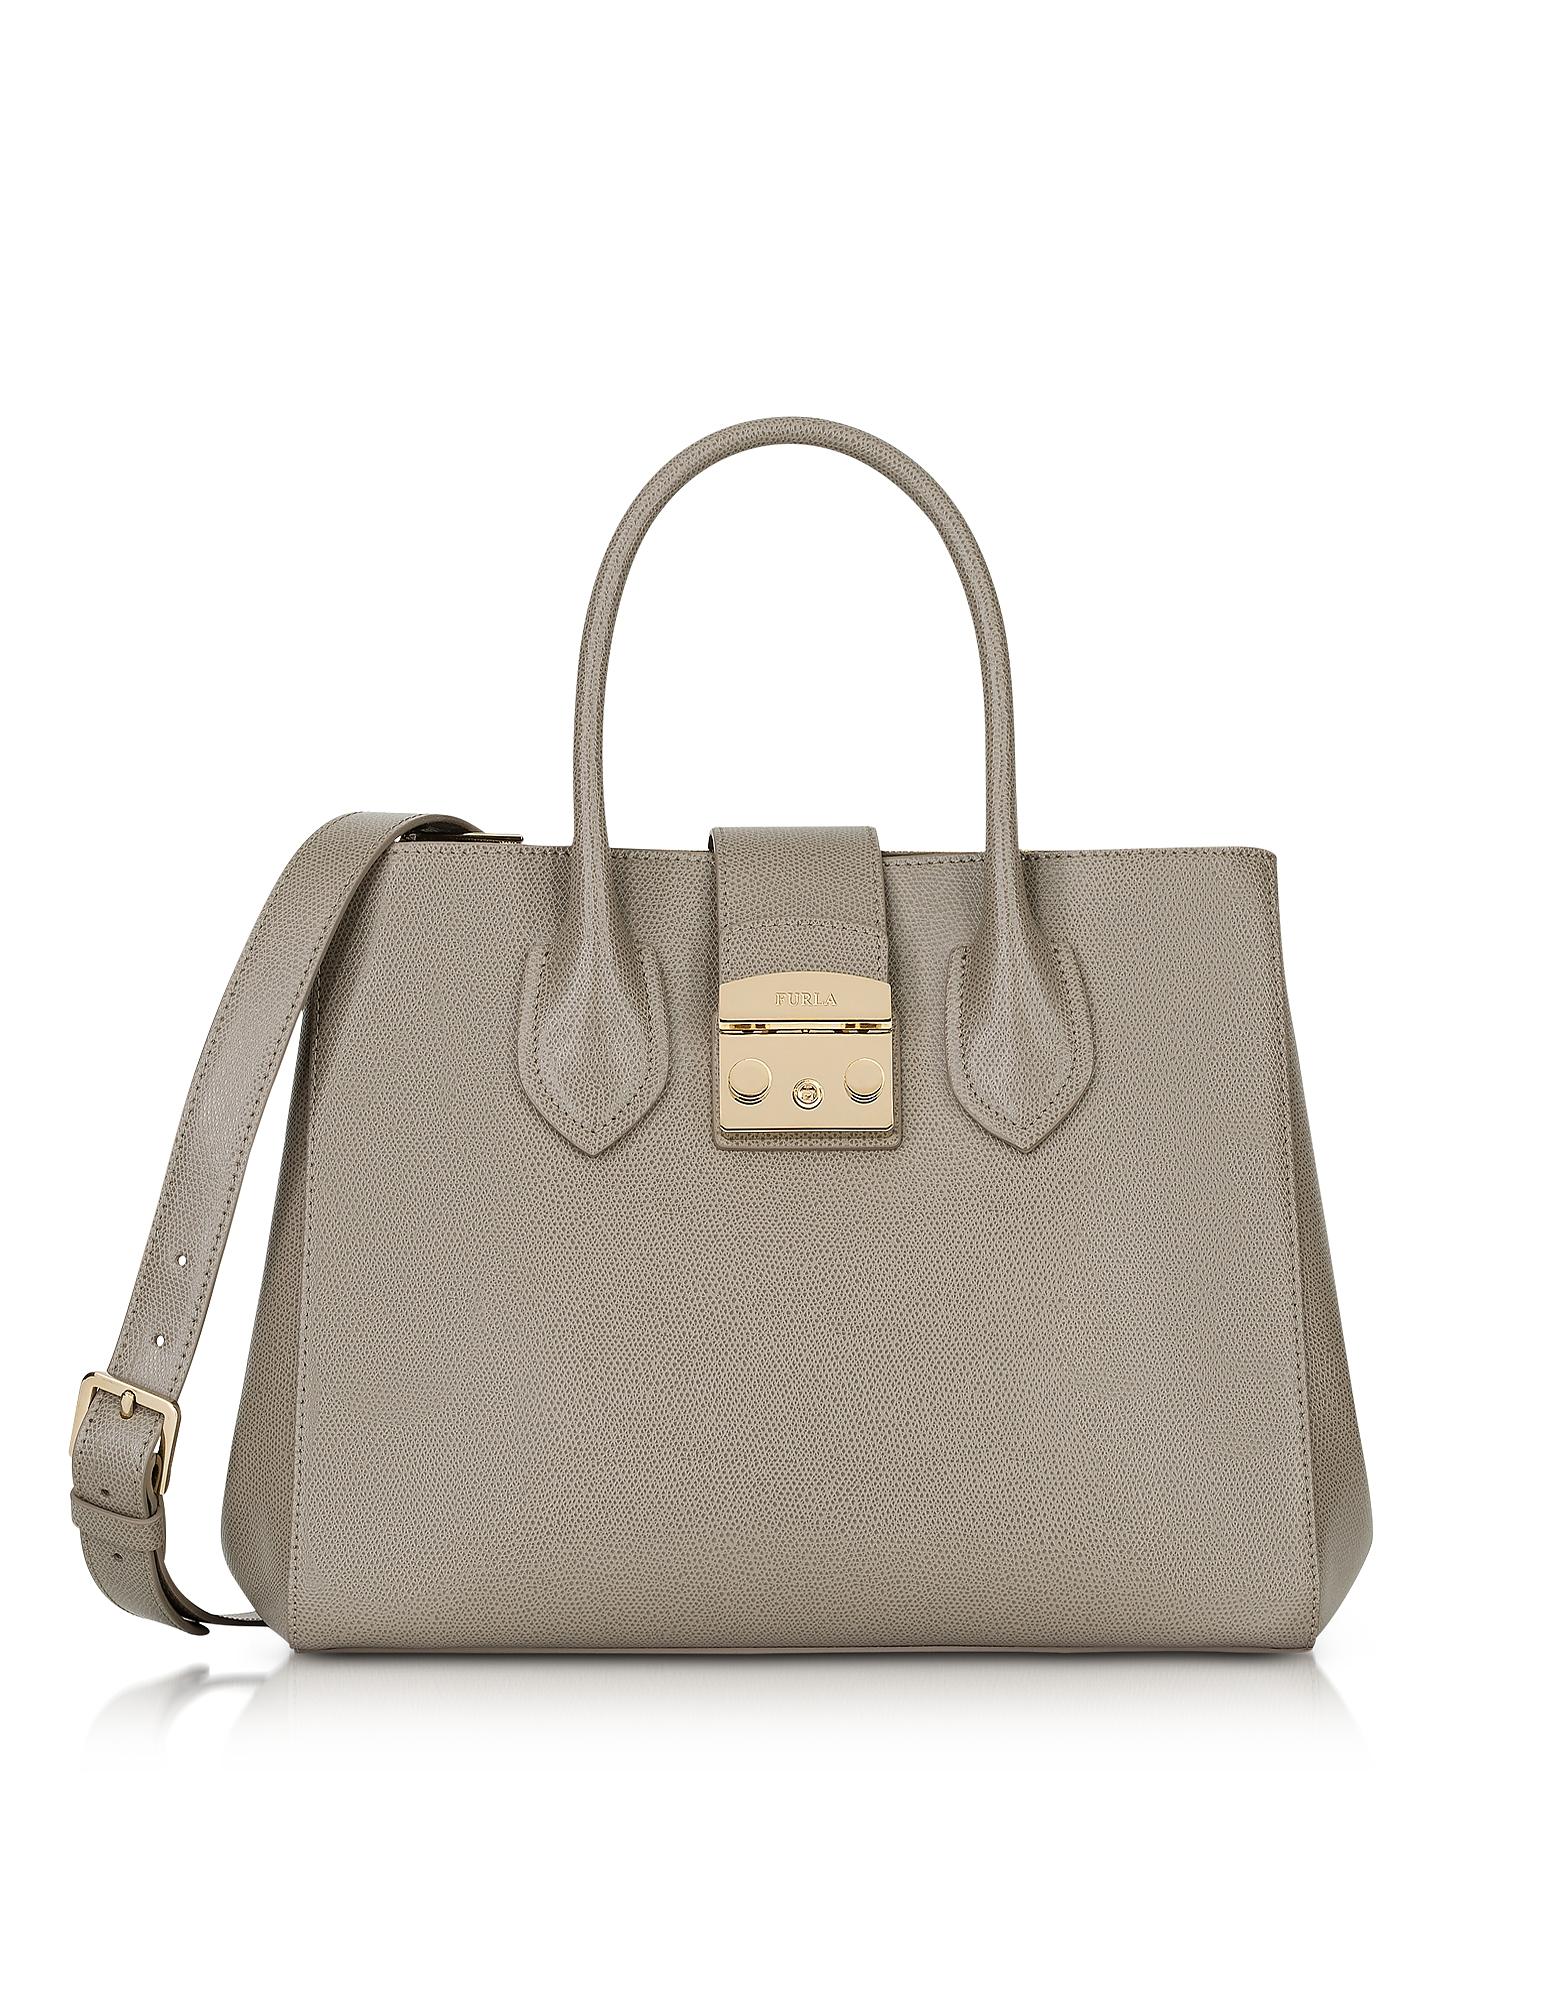 Furla Handbags, Sand Leather Metropolis Medium Tote Bag